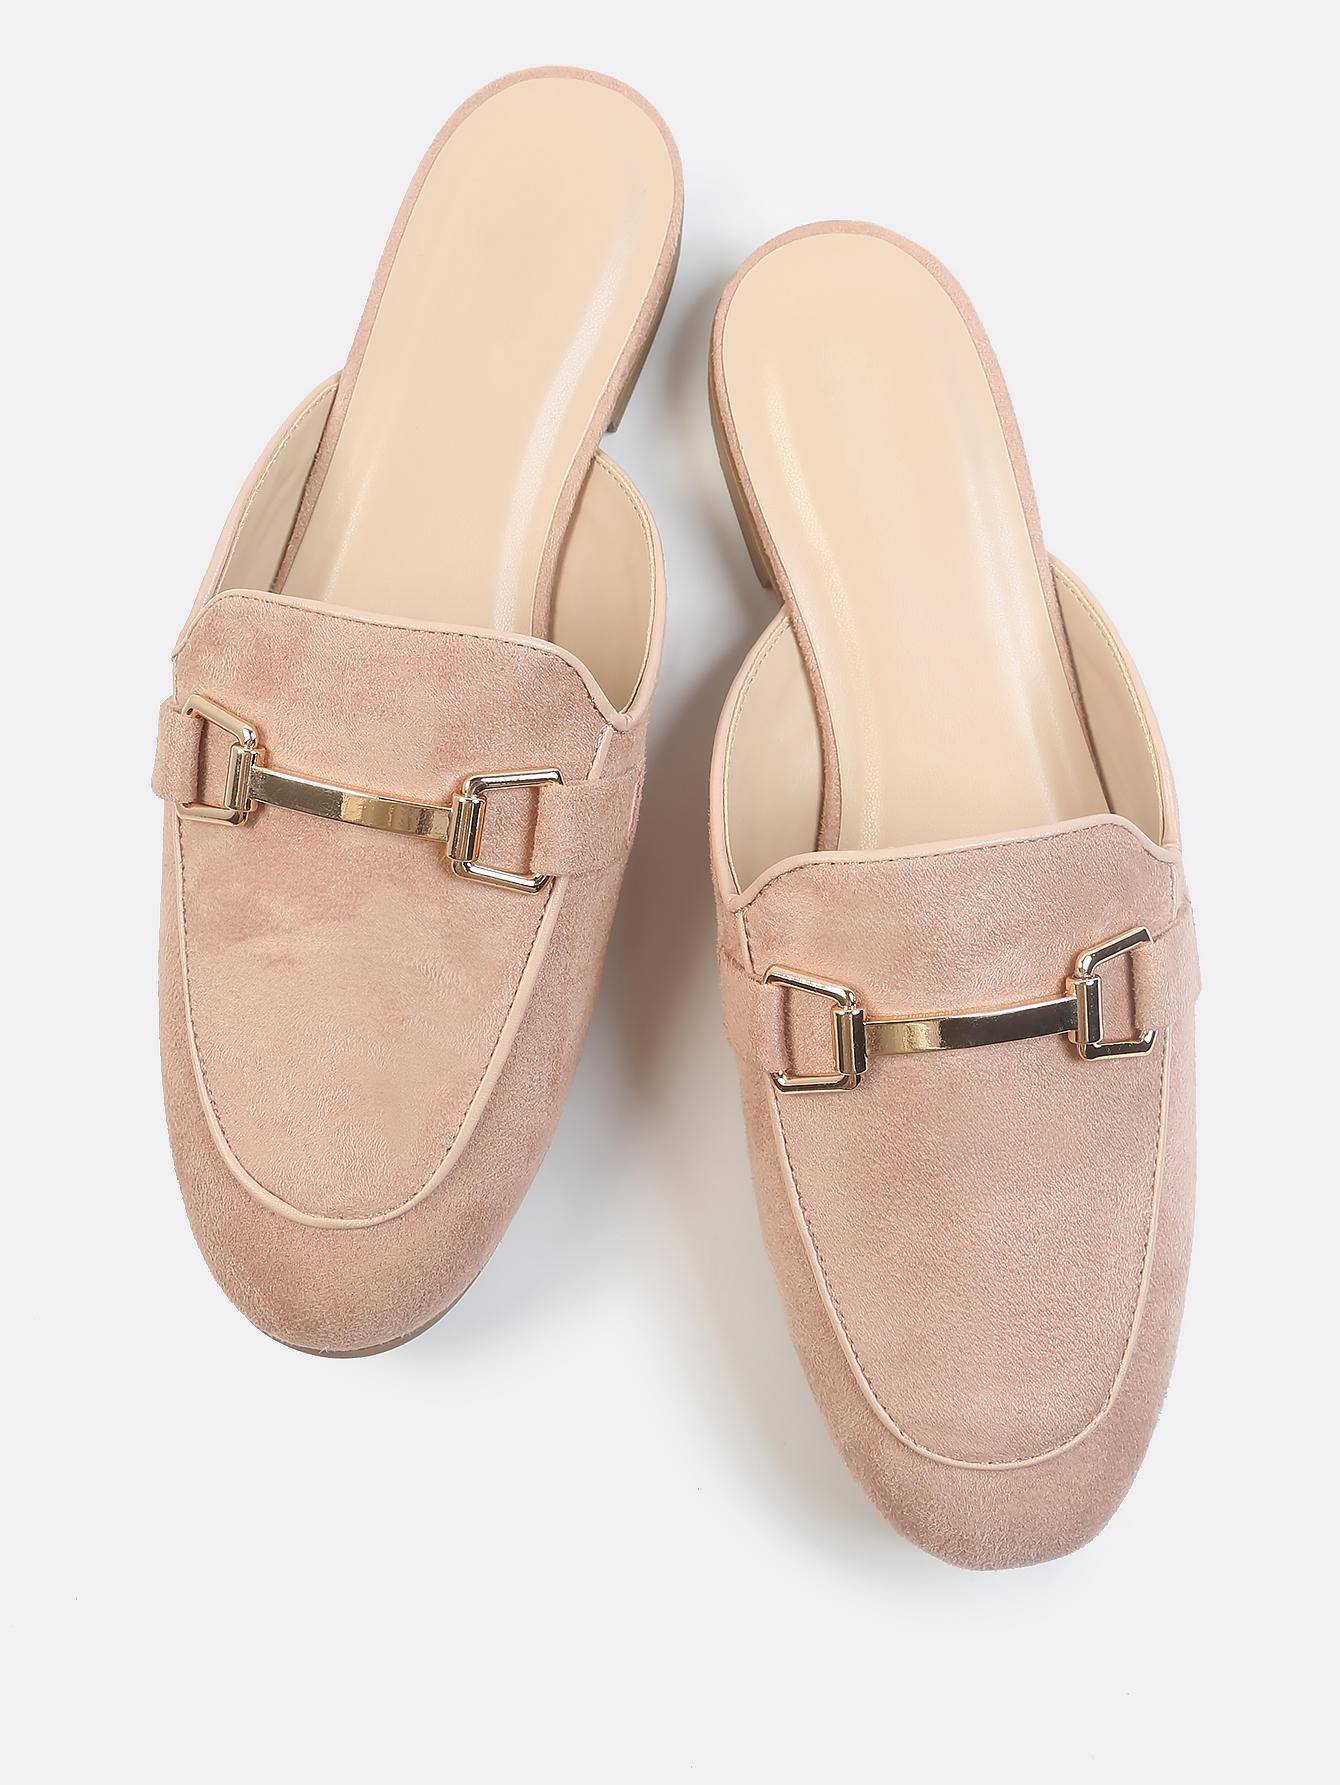 SheIn Pink Mules.jpg